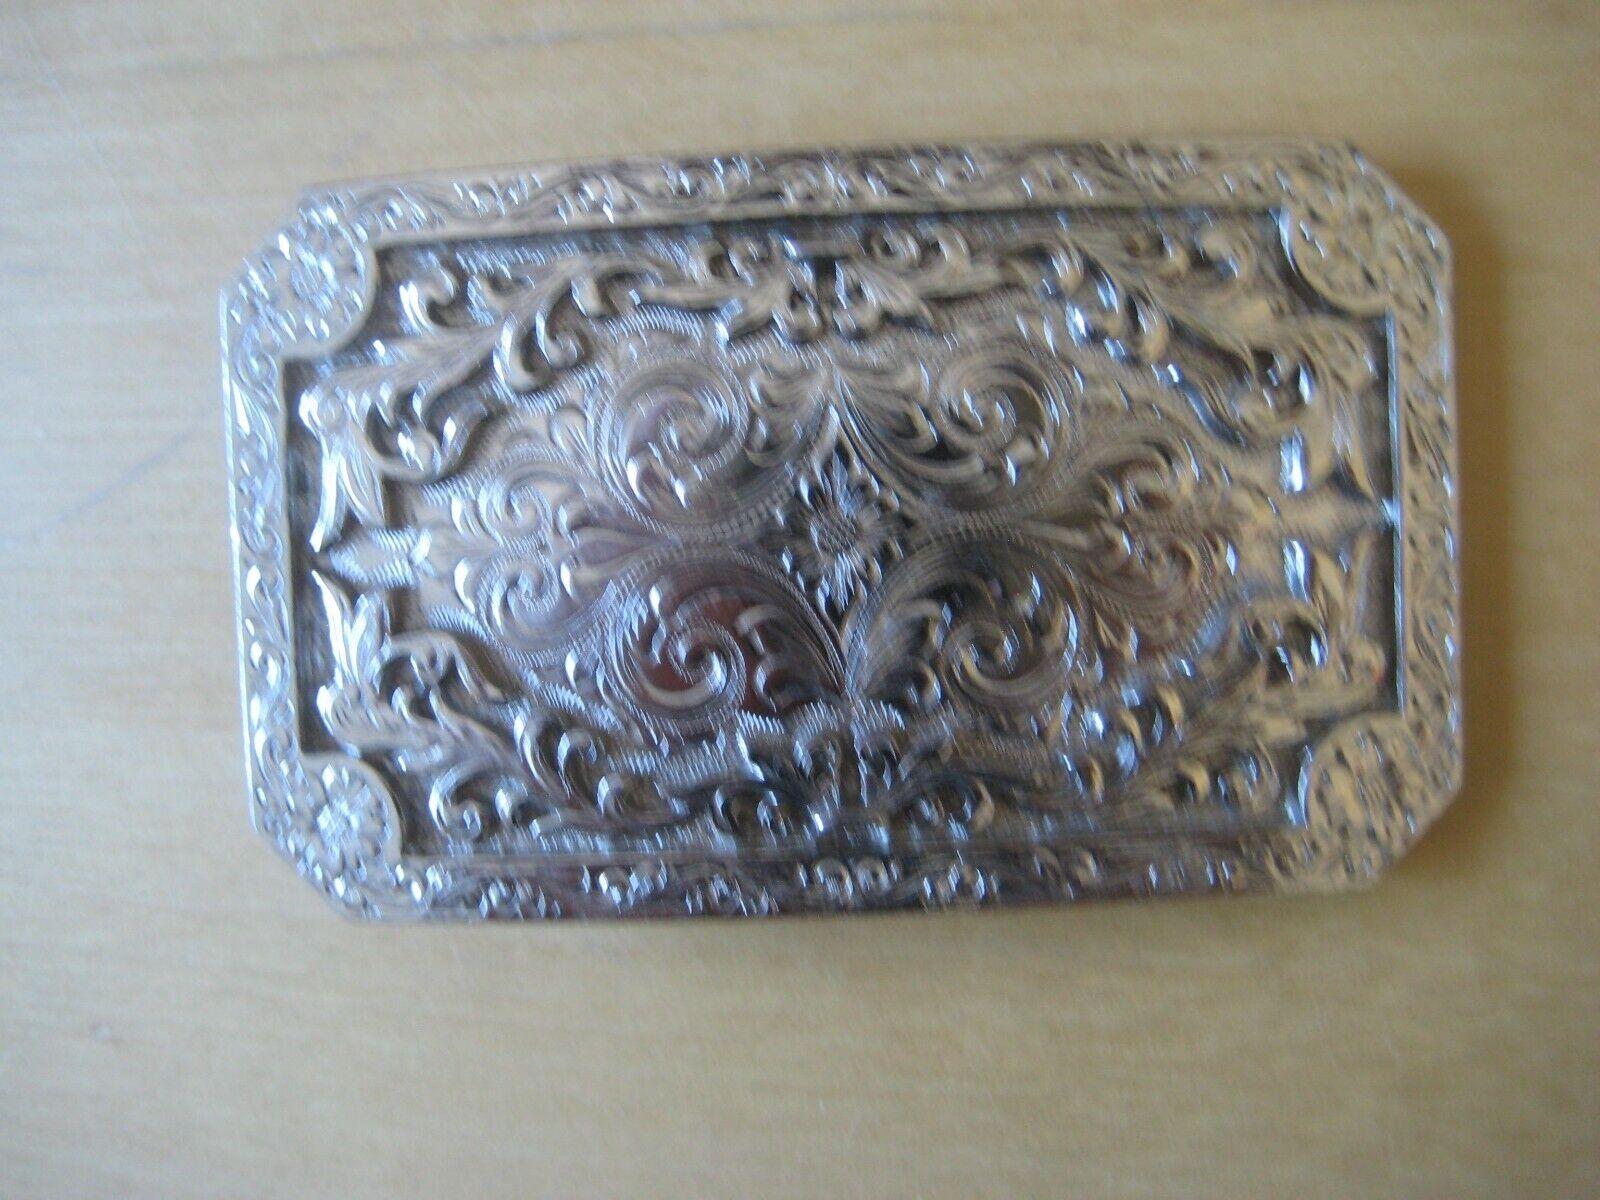 Woman's Silver Engraved Belt Buckle 3.5 x 2